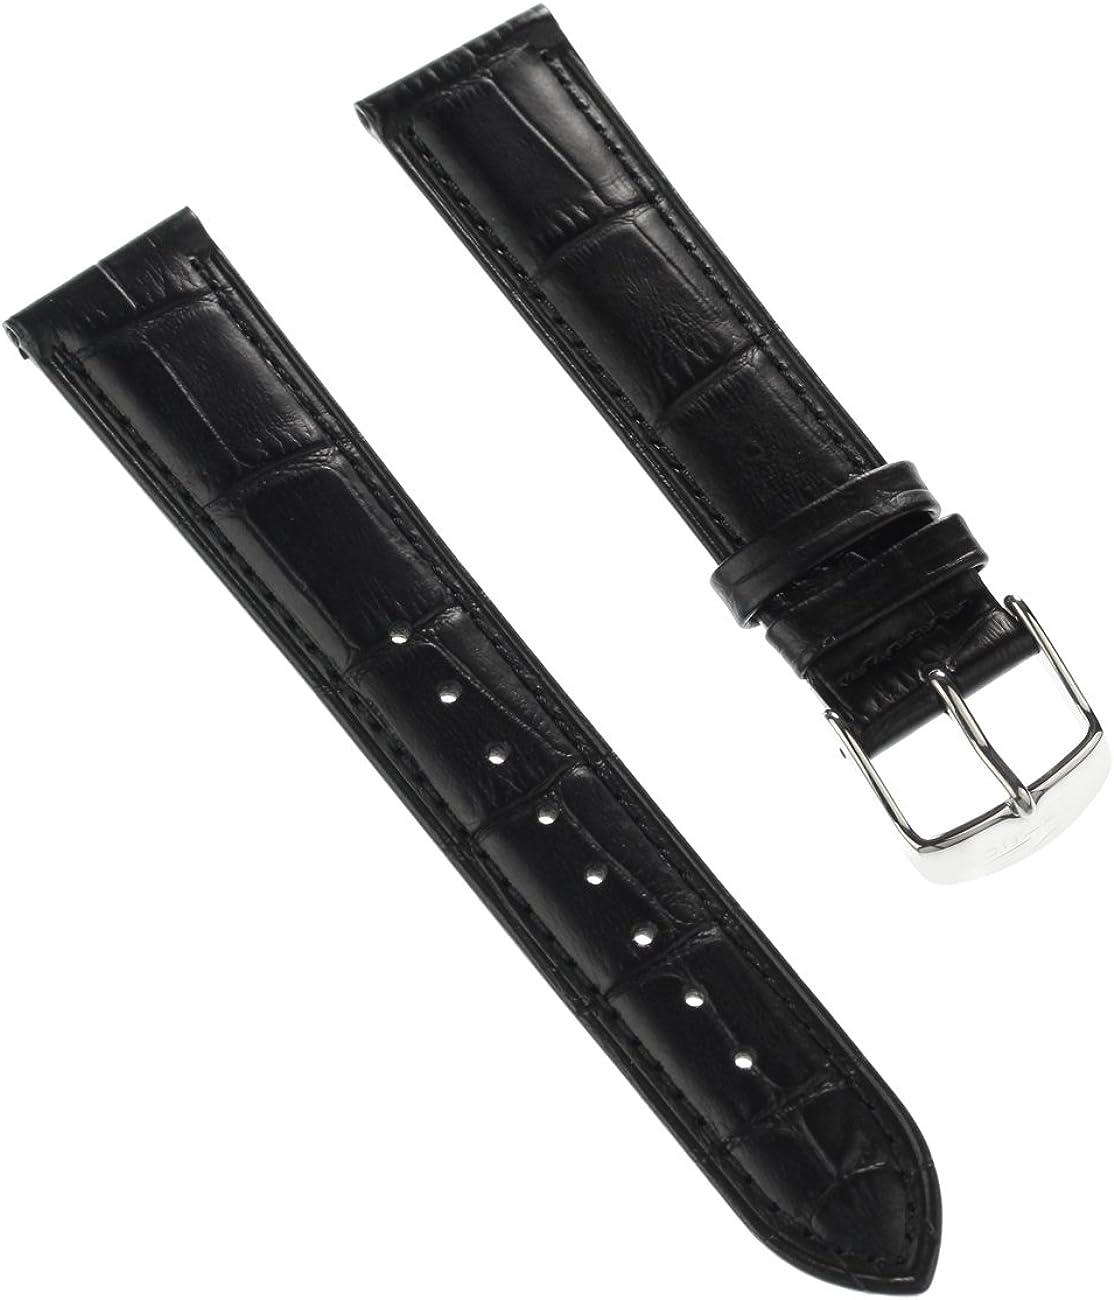 Lotus Reloj de Pulsera Fashion Material de la Correa Piel Negro para Lotus L15978, l15975Relojes